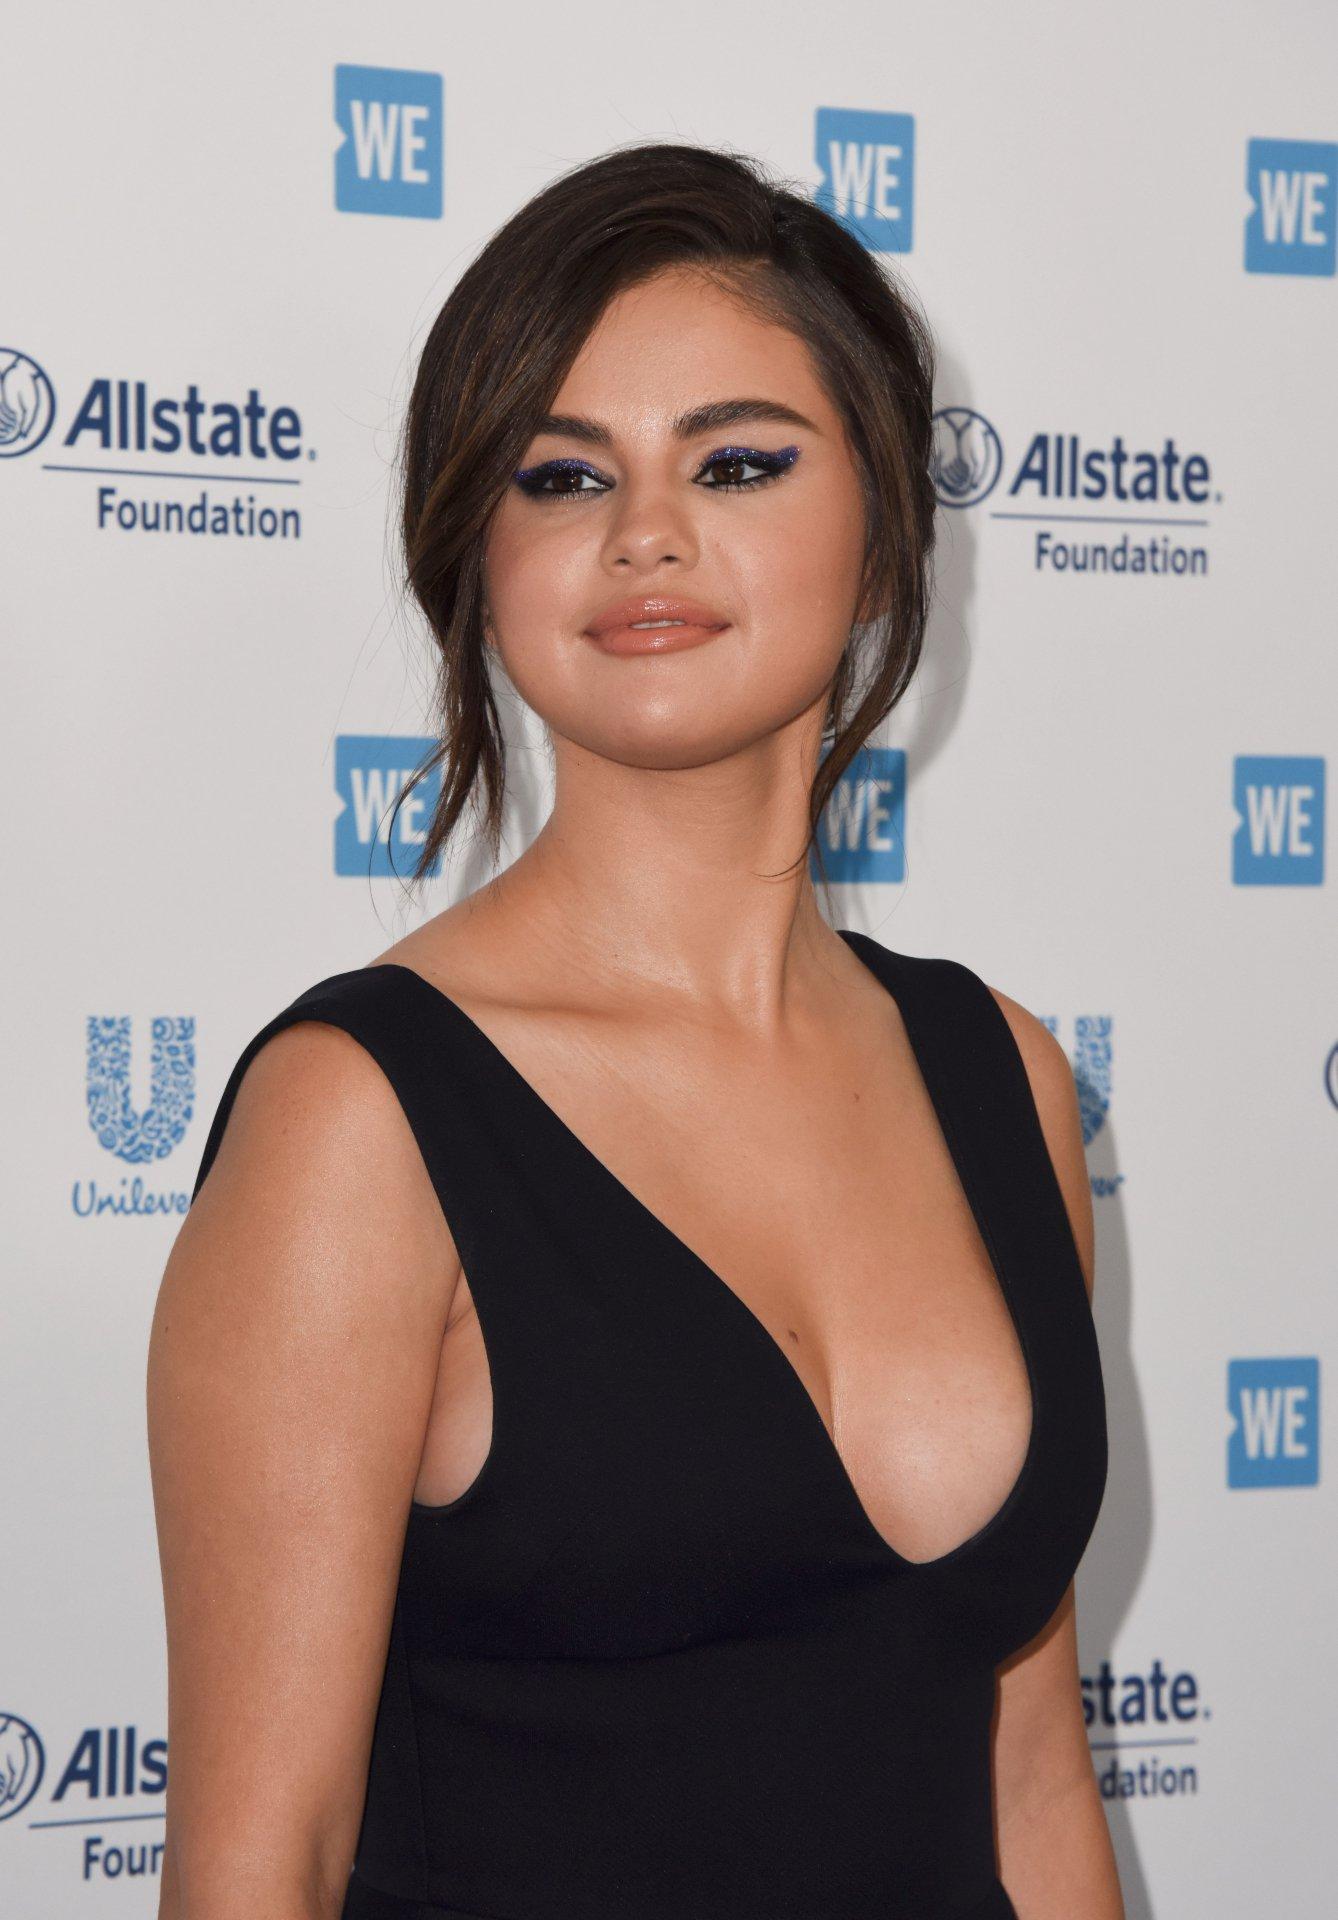 Selena Gomez - Sexy Big Cleavage at WE Day California 2019